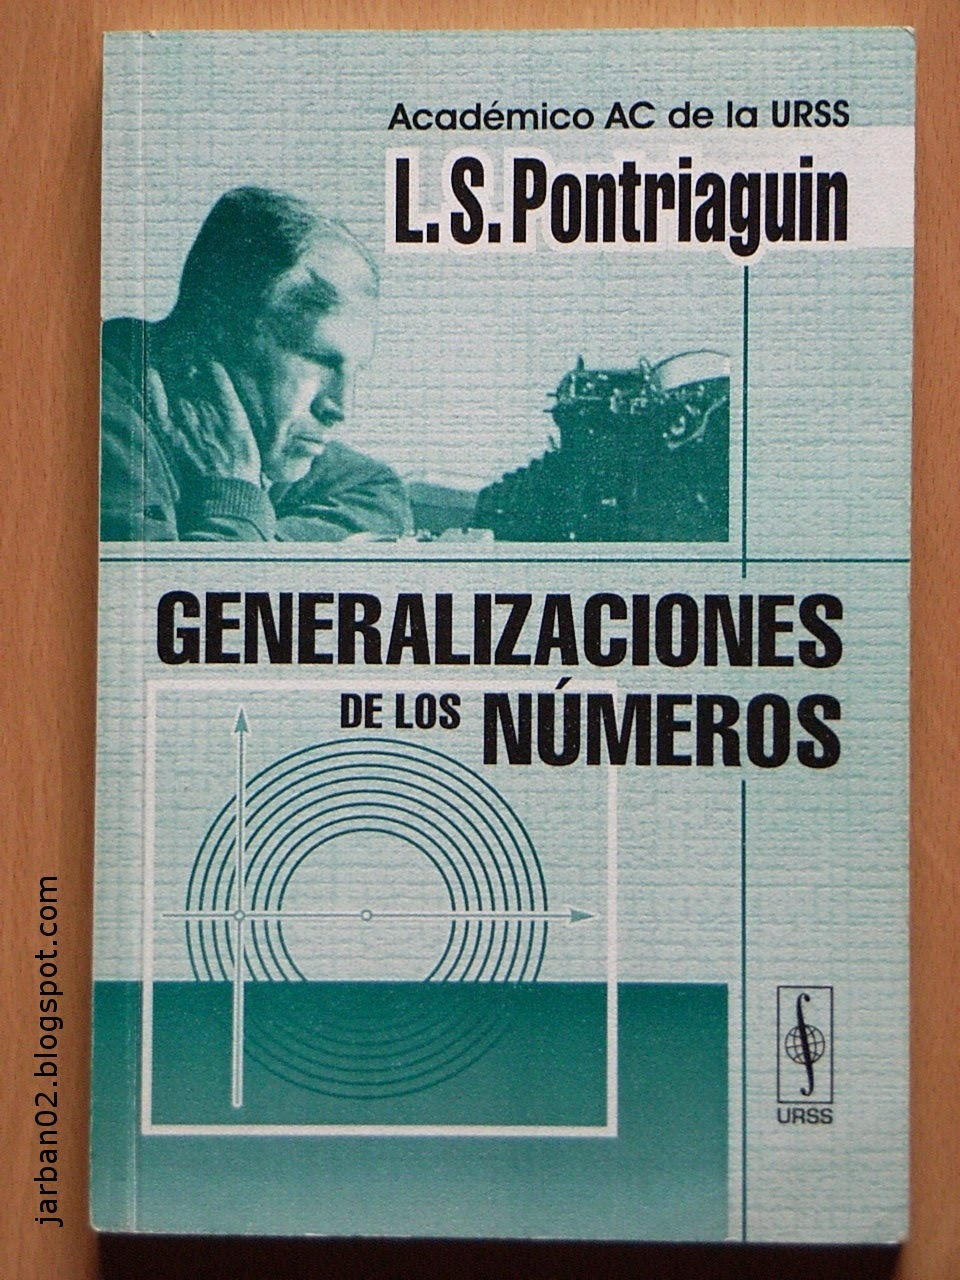 jarban02_pic043: Generalizaciones de los números de L.S. Pontriaguin